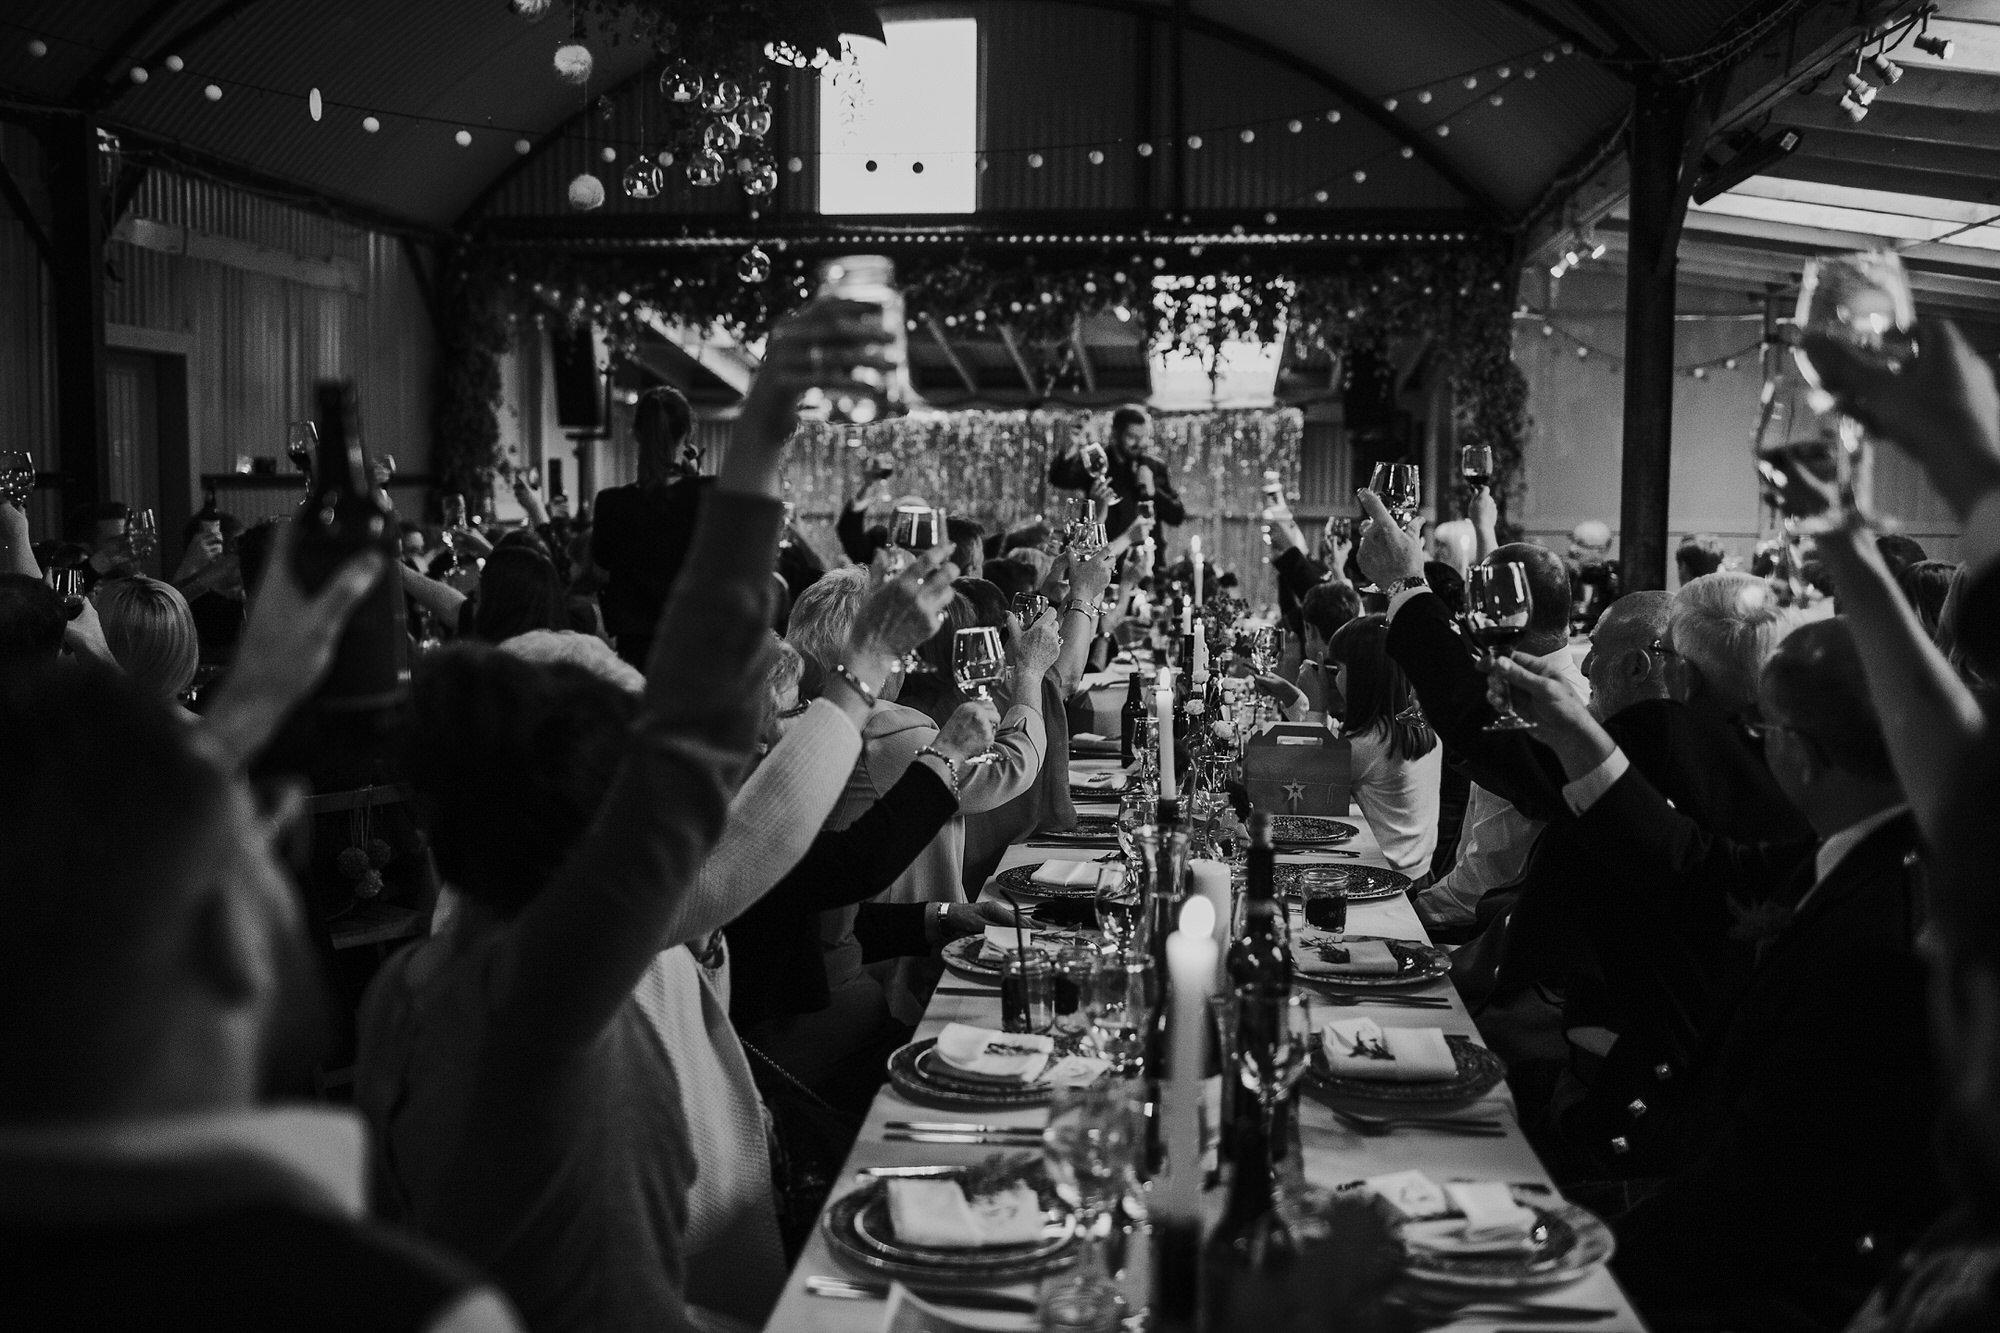 065 TIN SHED KNOCKRAICH FARM WEDDING ALTERNATIVE BRIDE ZOE ALEXANDRA PHOTOGRAPHY